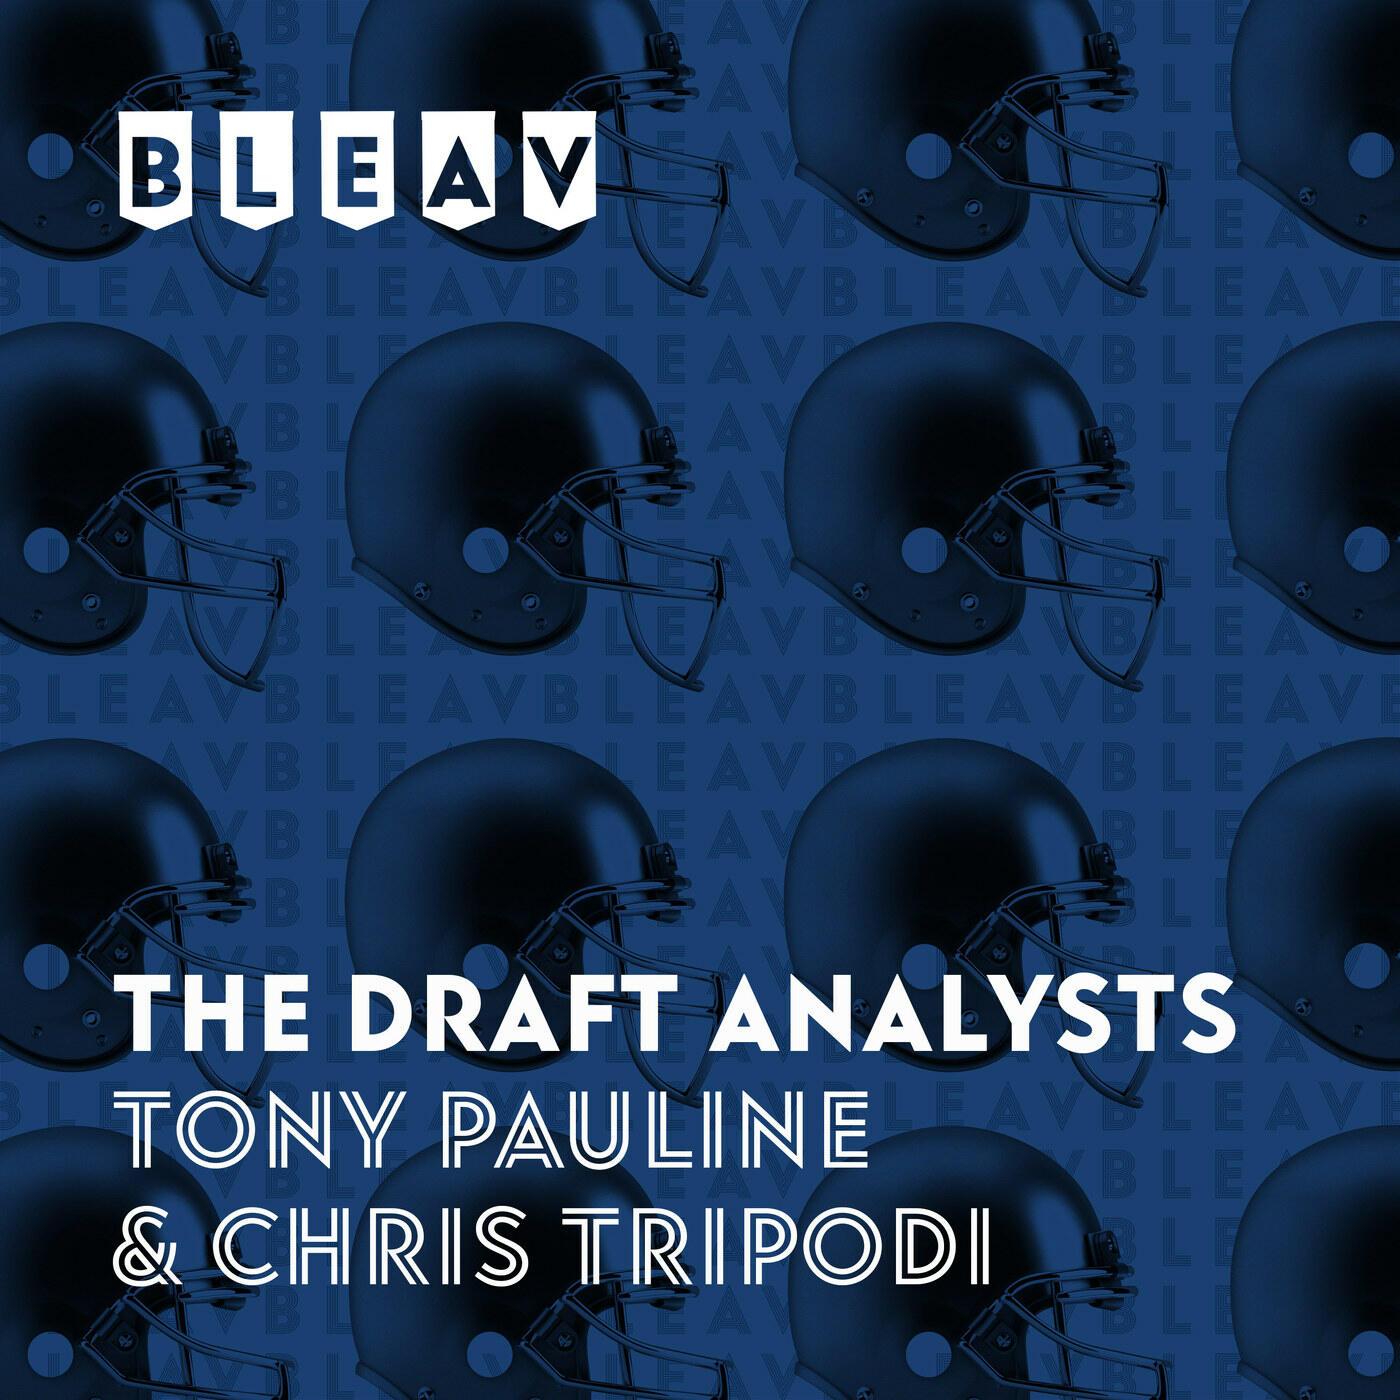 Bleav in The Draft Analysts with Tony Pauline & Chris Tripodi